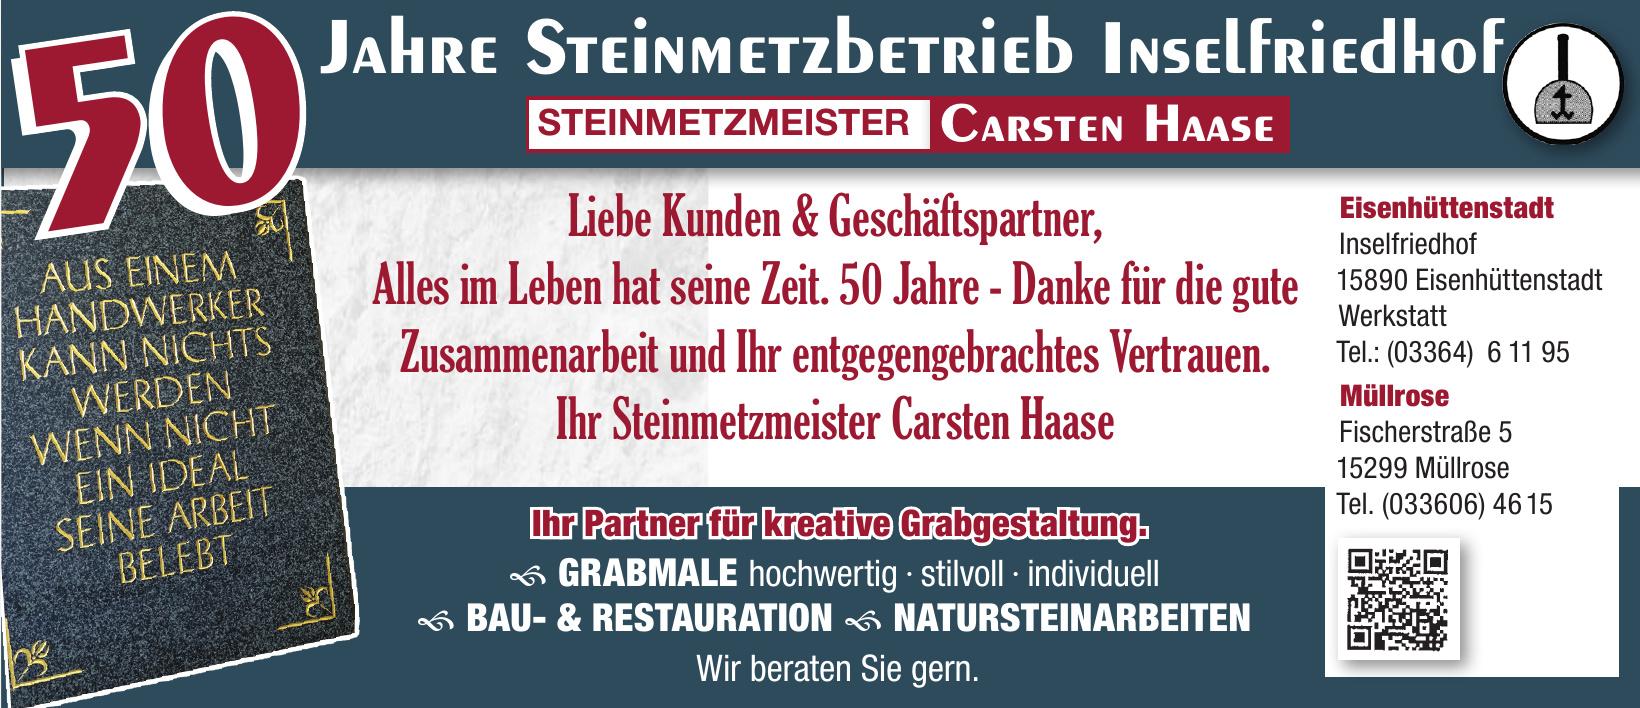 Steinmetzbetrieb Inselfriedhof - Steinmetzmeister Carsten Haase